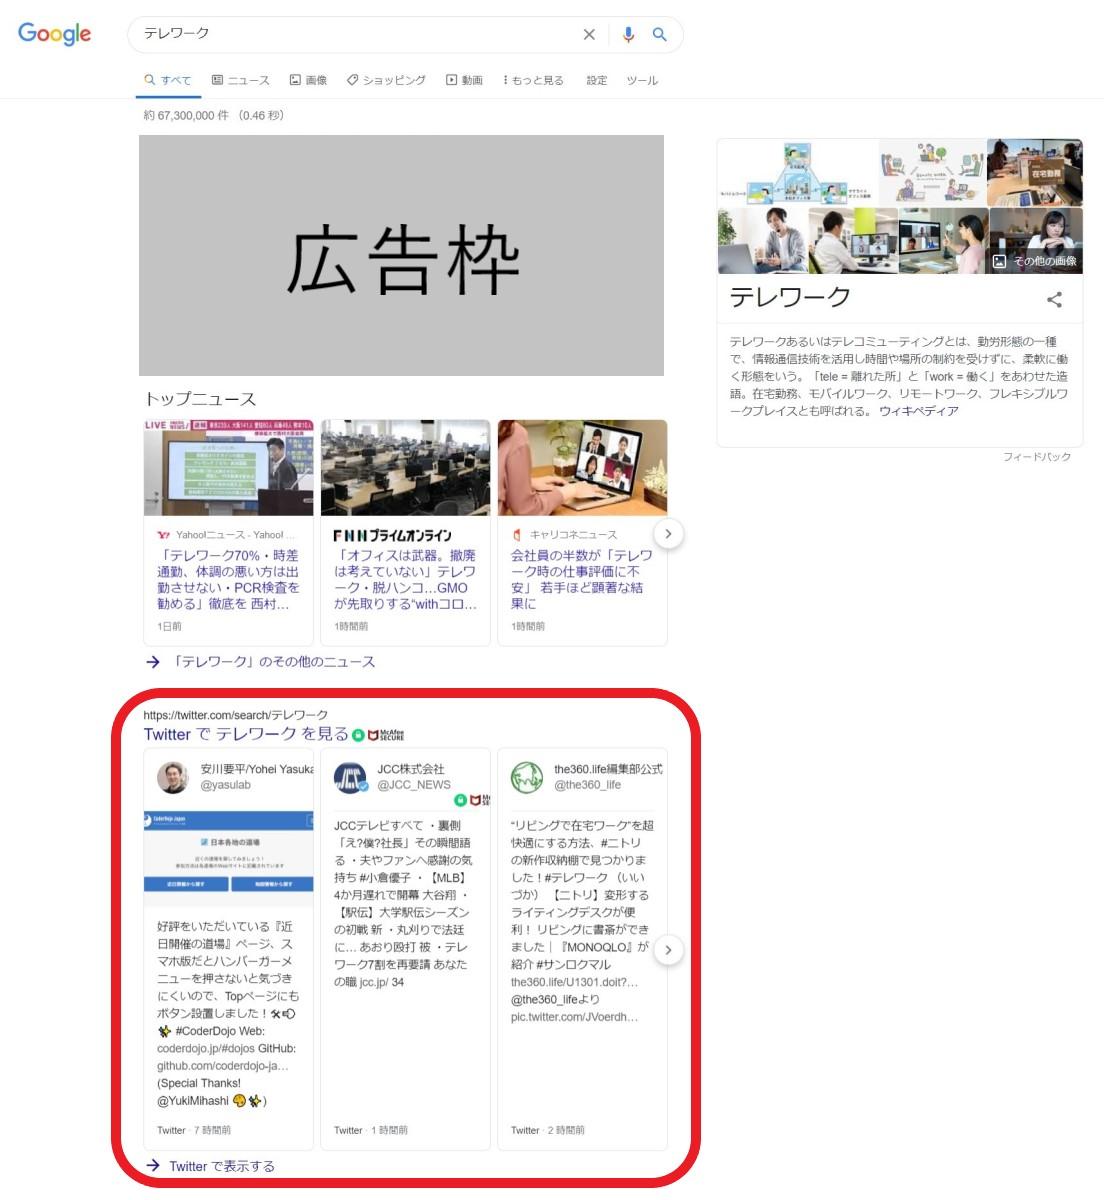 google-search-result-telework-1